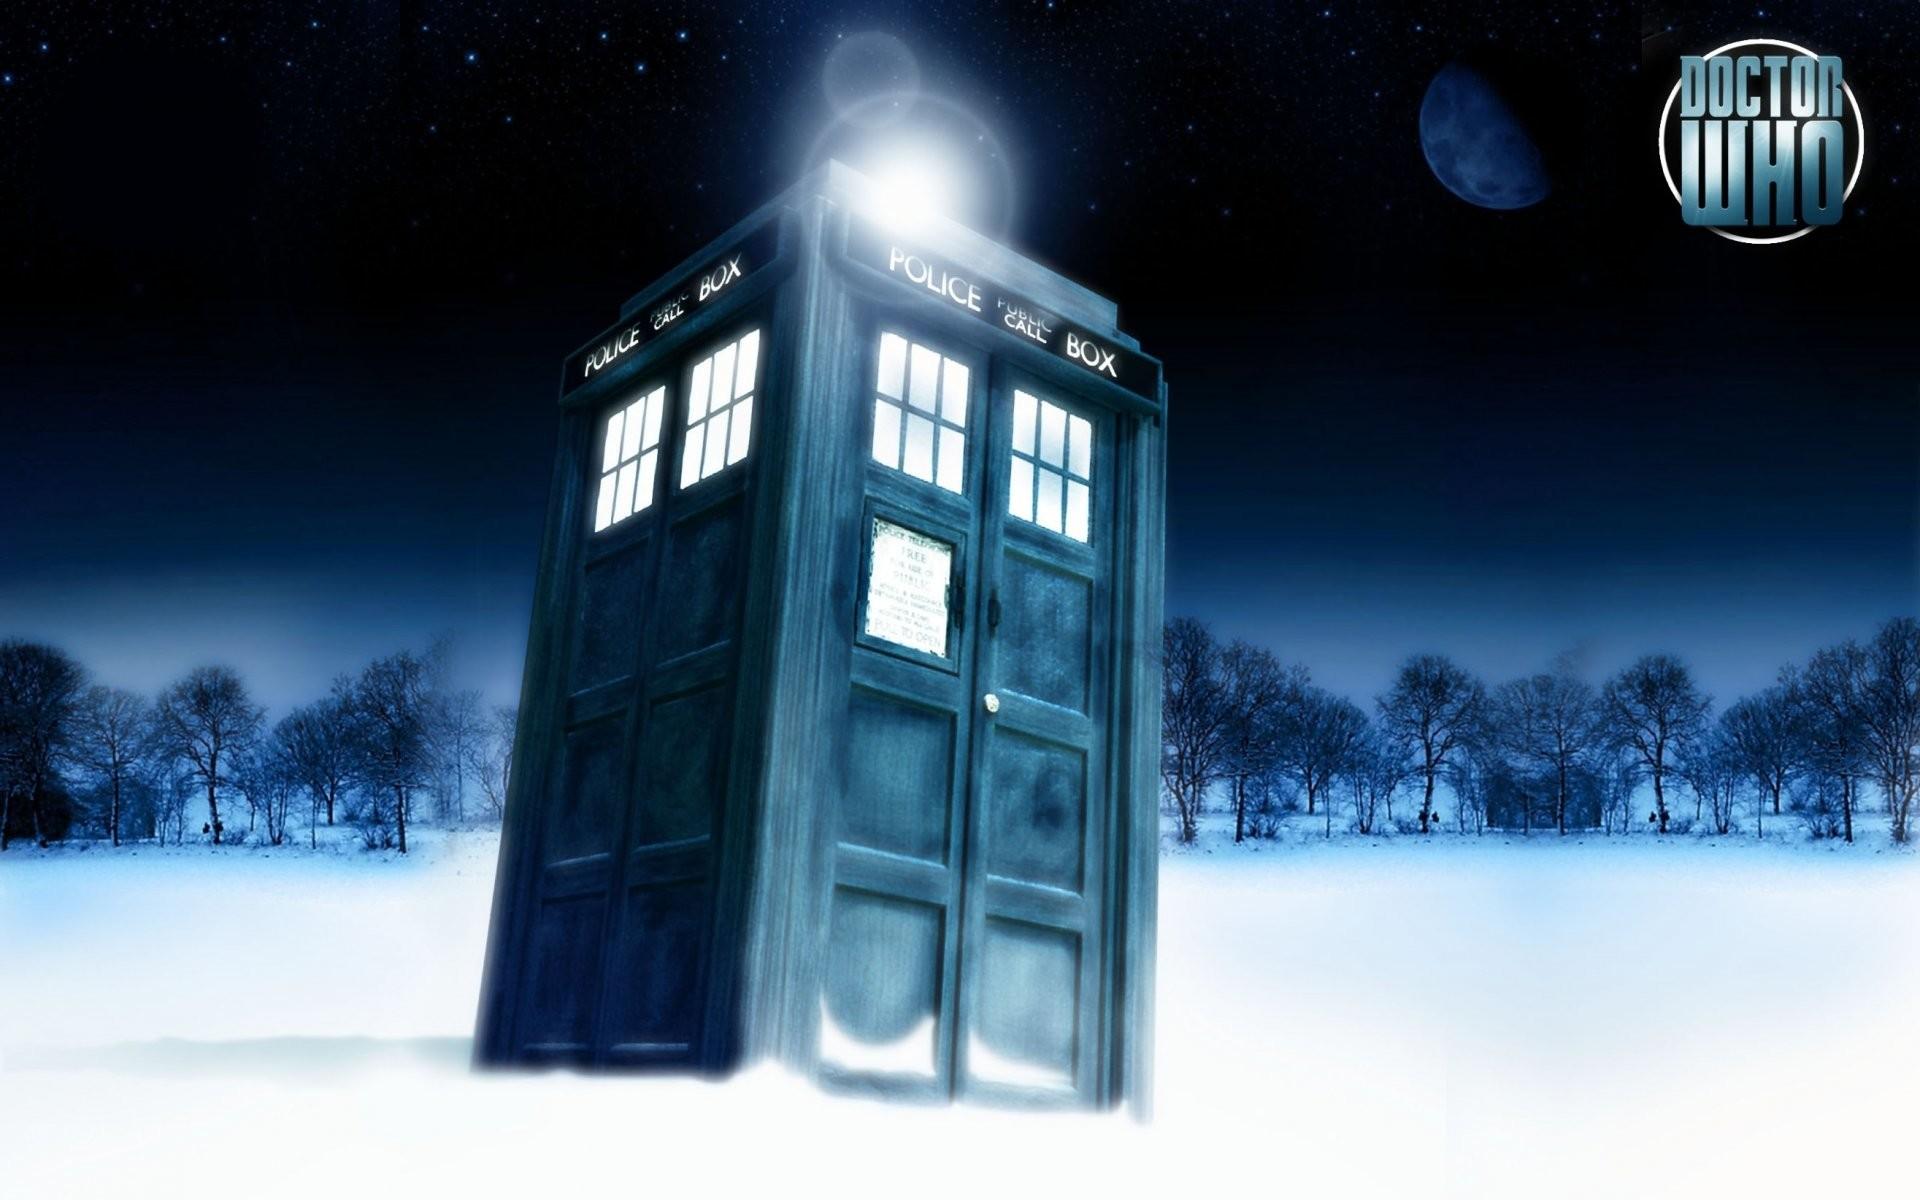 Doctor Who Tardis Wallpaper 1920×1080 TARDIS Wallpapers (38 Wallpapers) |  Adorable Wallpapers